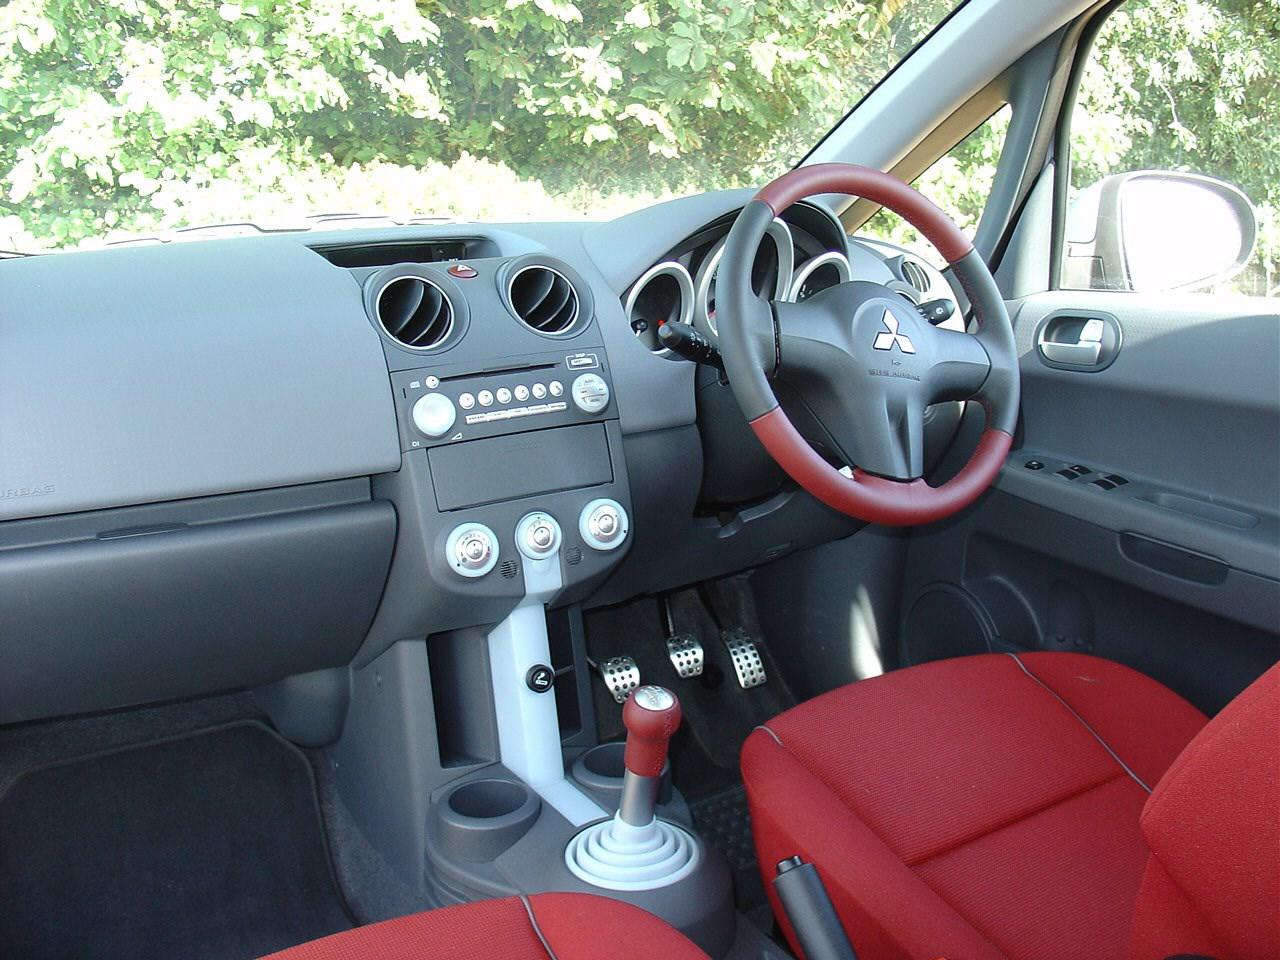 Mitsubishi Colt Hatchback Review 2004 2013 Parkers